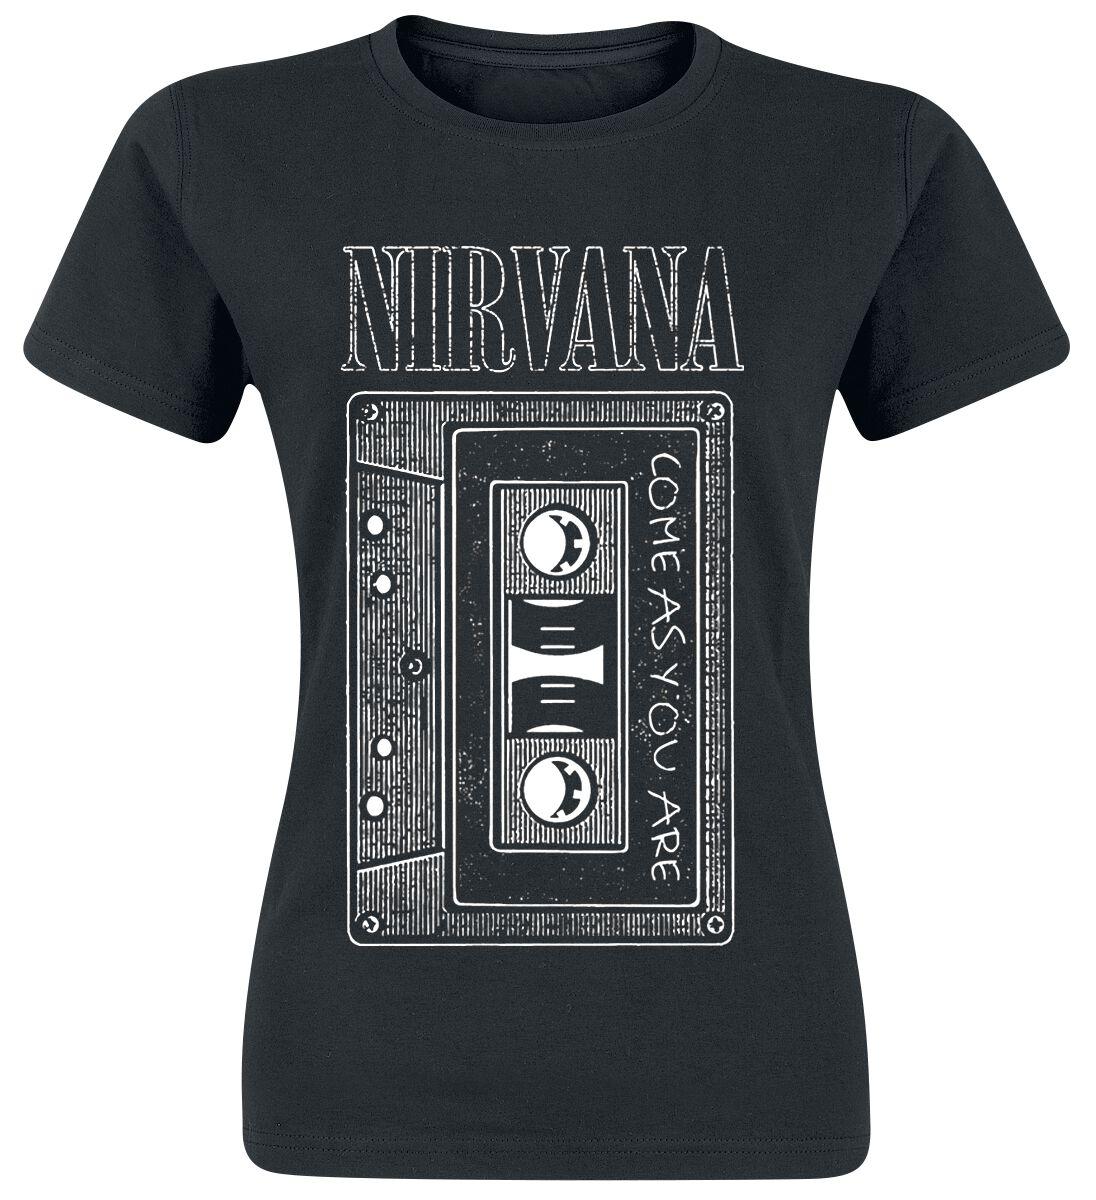 Zespoły - Koszulki - Koszulka damska Nirvana As You Are Tape Koszulka damska czarny - 329844